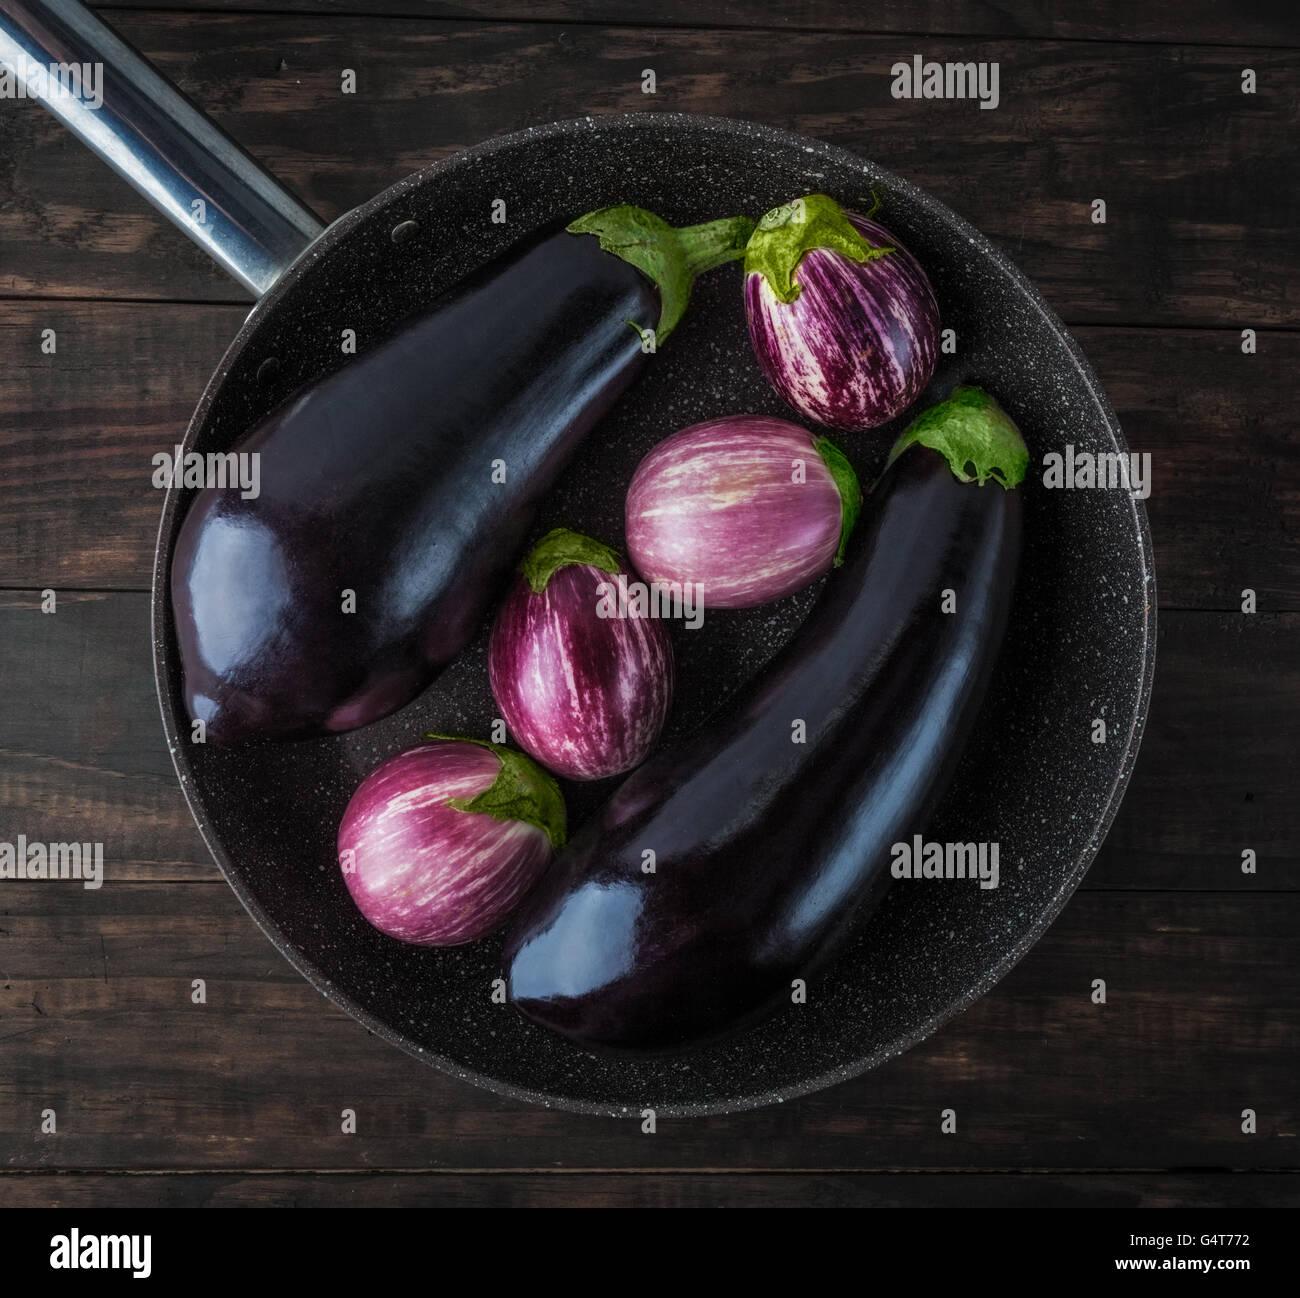 Whole eggplants on frying pan top view. Classic and Listada de Gandia varieties. Top view. - Stock Image